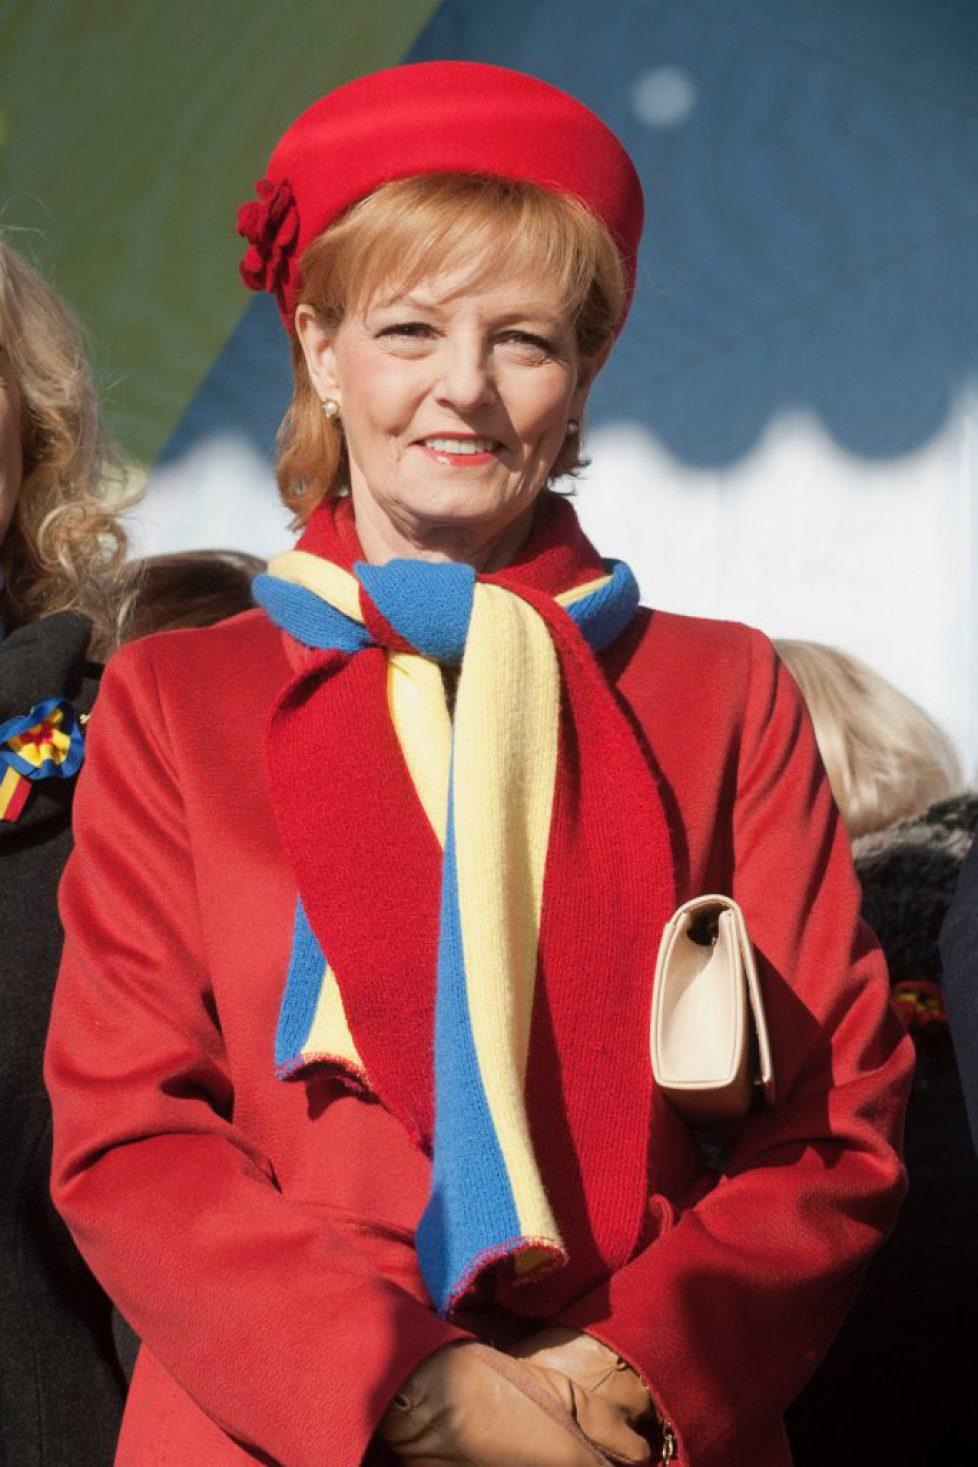 Majestatea-Sa-Margareta-Custodele-Coroanei-Principele-Radu-Principesa-Sofia-1-Decembrie-2019-Iasi_ANG5090